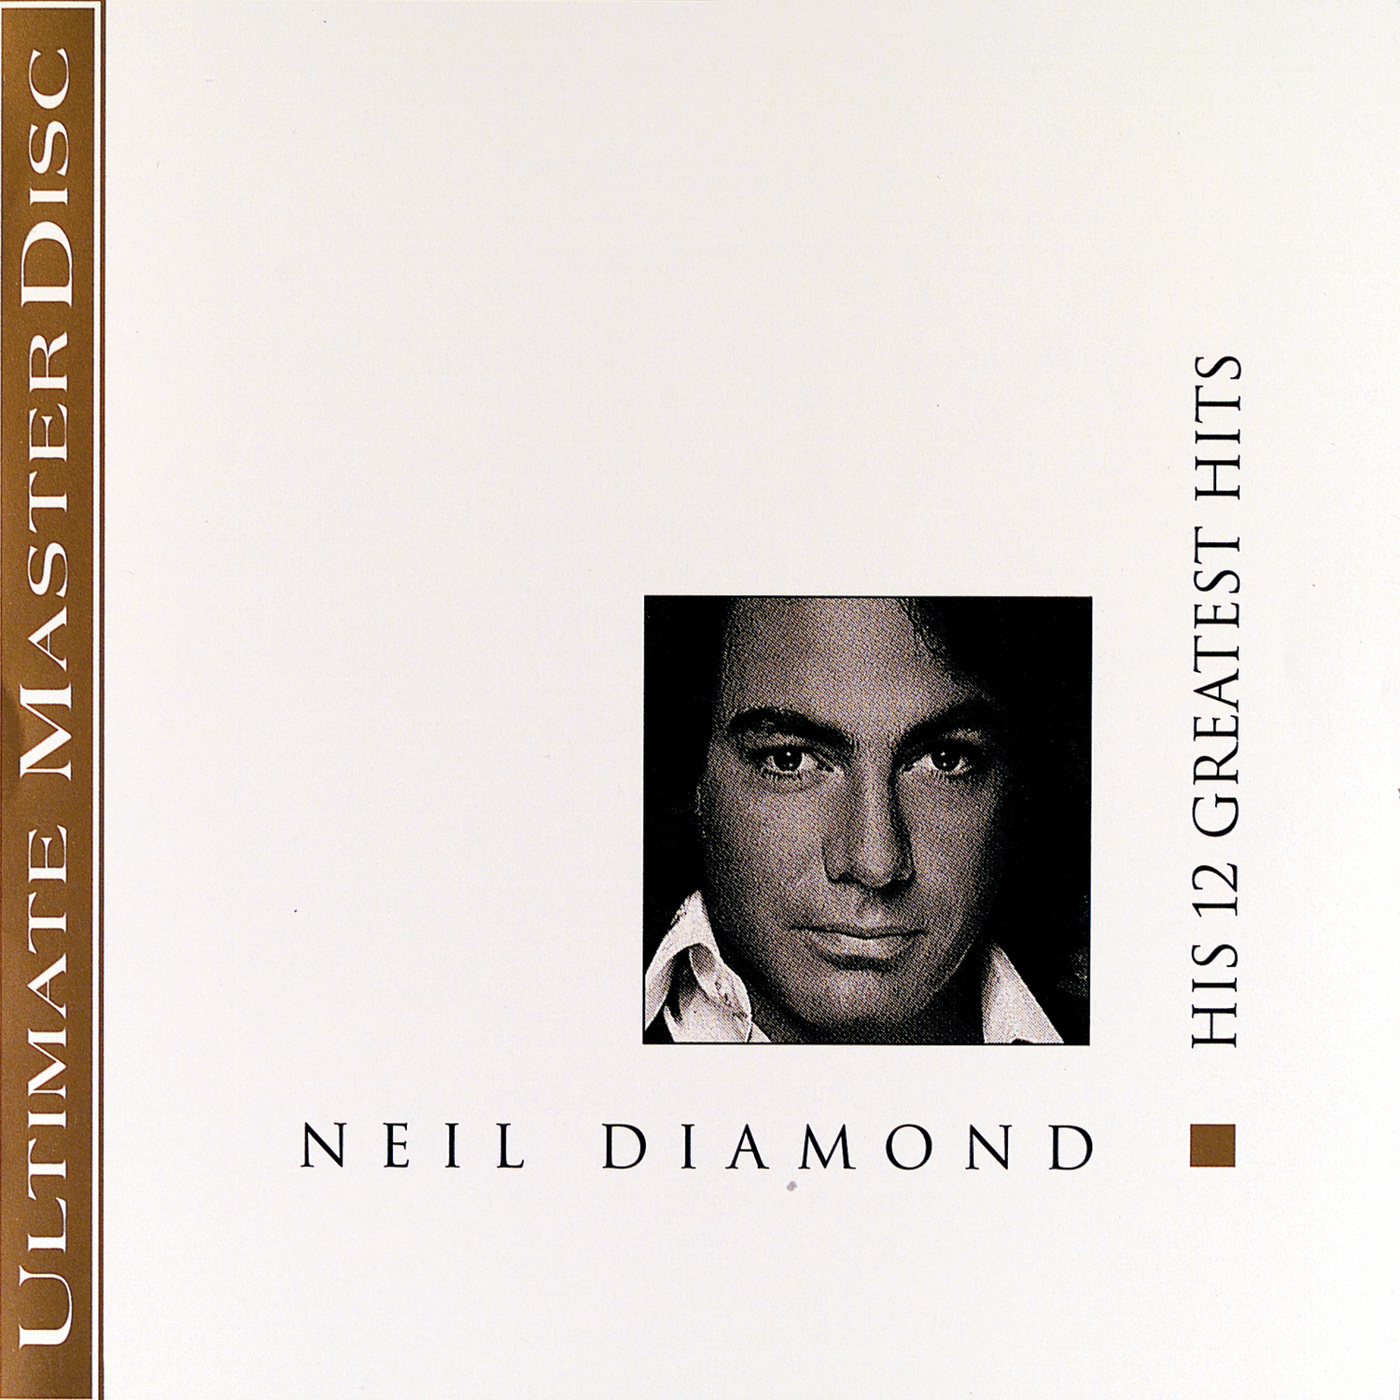 cD Neil Diamond- His 12 Greatest Hits (Album Cover